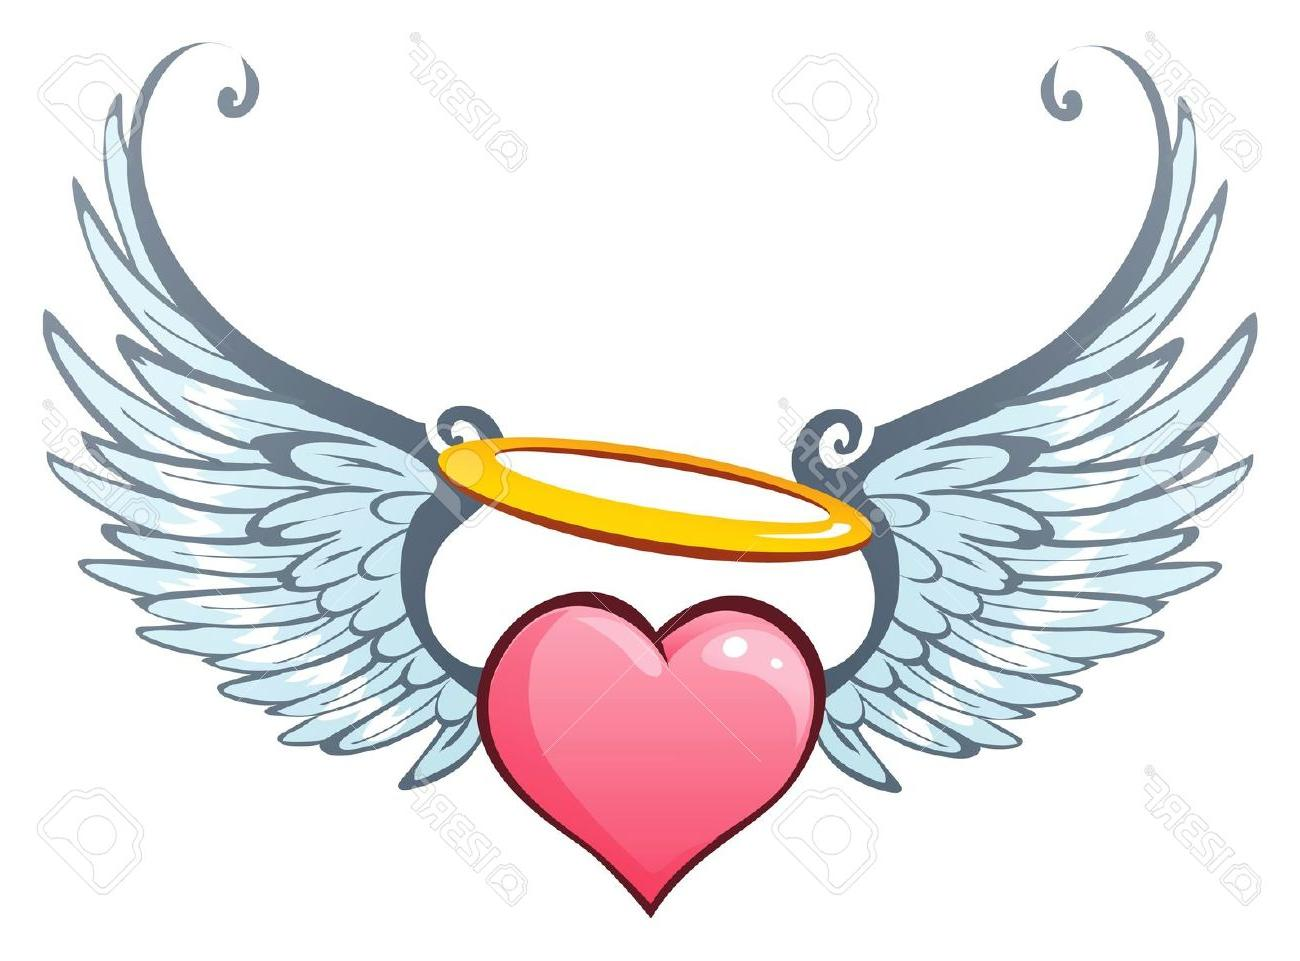 1300x961 Best Heart Angel Wings Vector Art Images Free Vector Art, Images